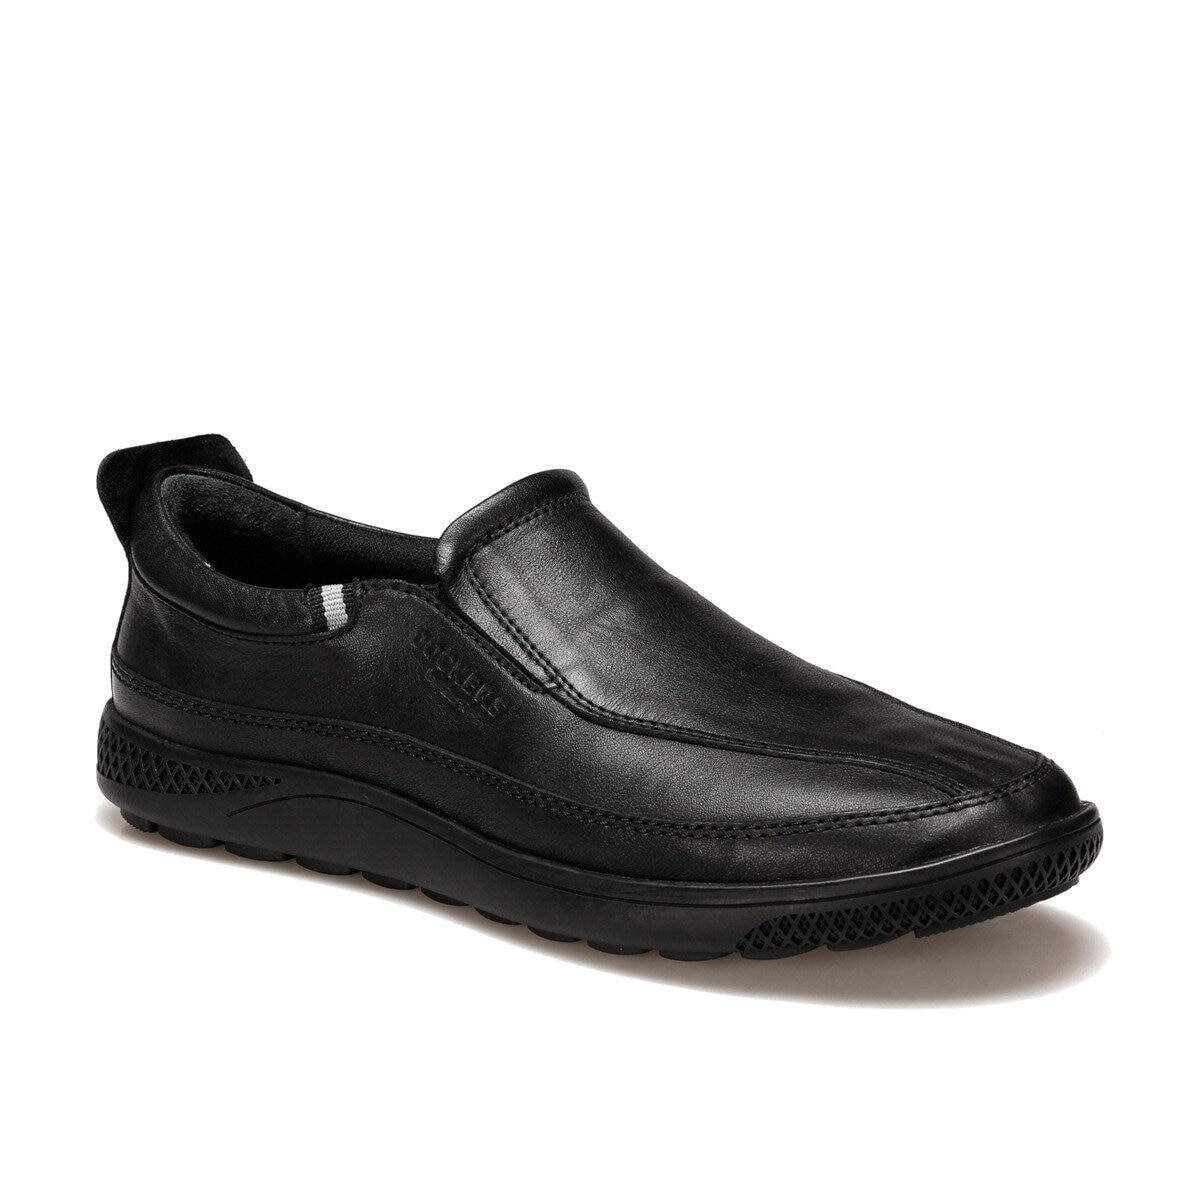 FLO 228281 Black Men 'S Comfort Shoes By Dockers The Gerle